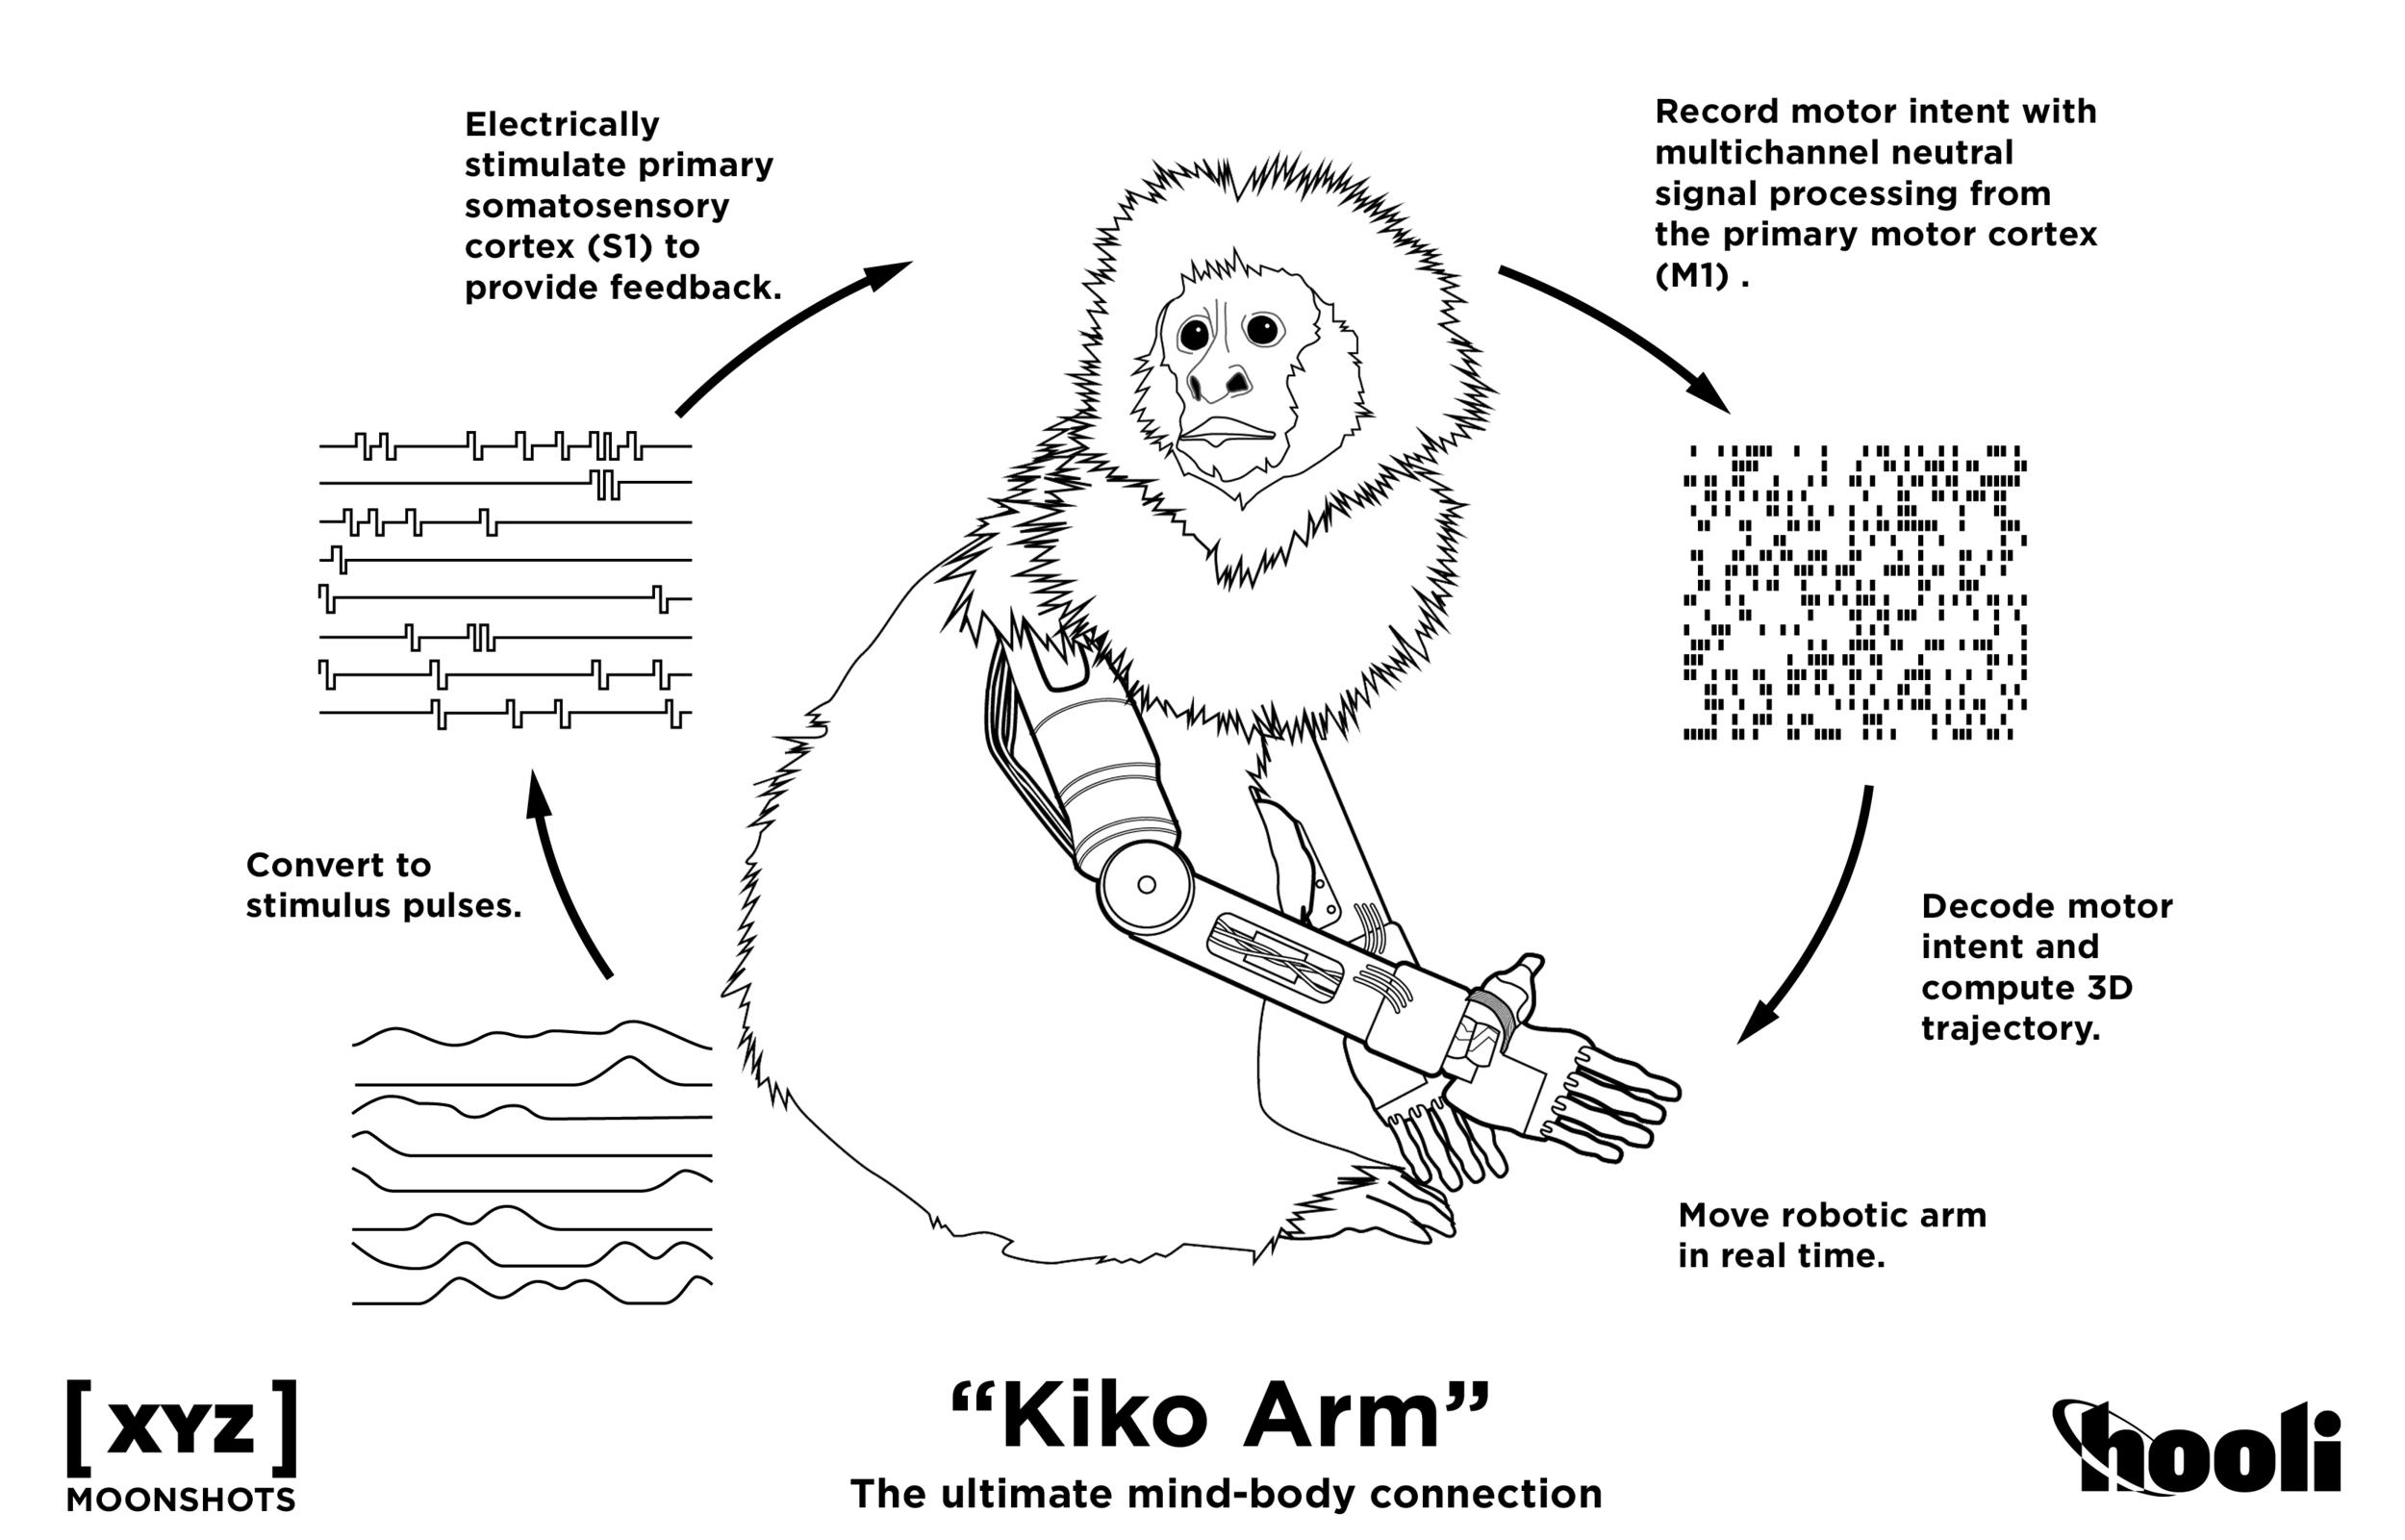 Kikoarm_Moonshot (1).png